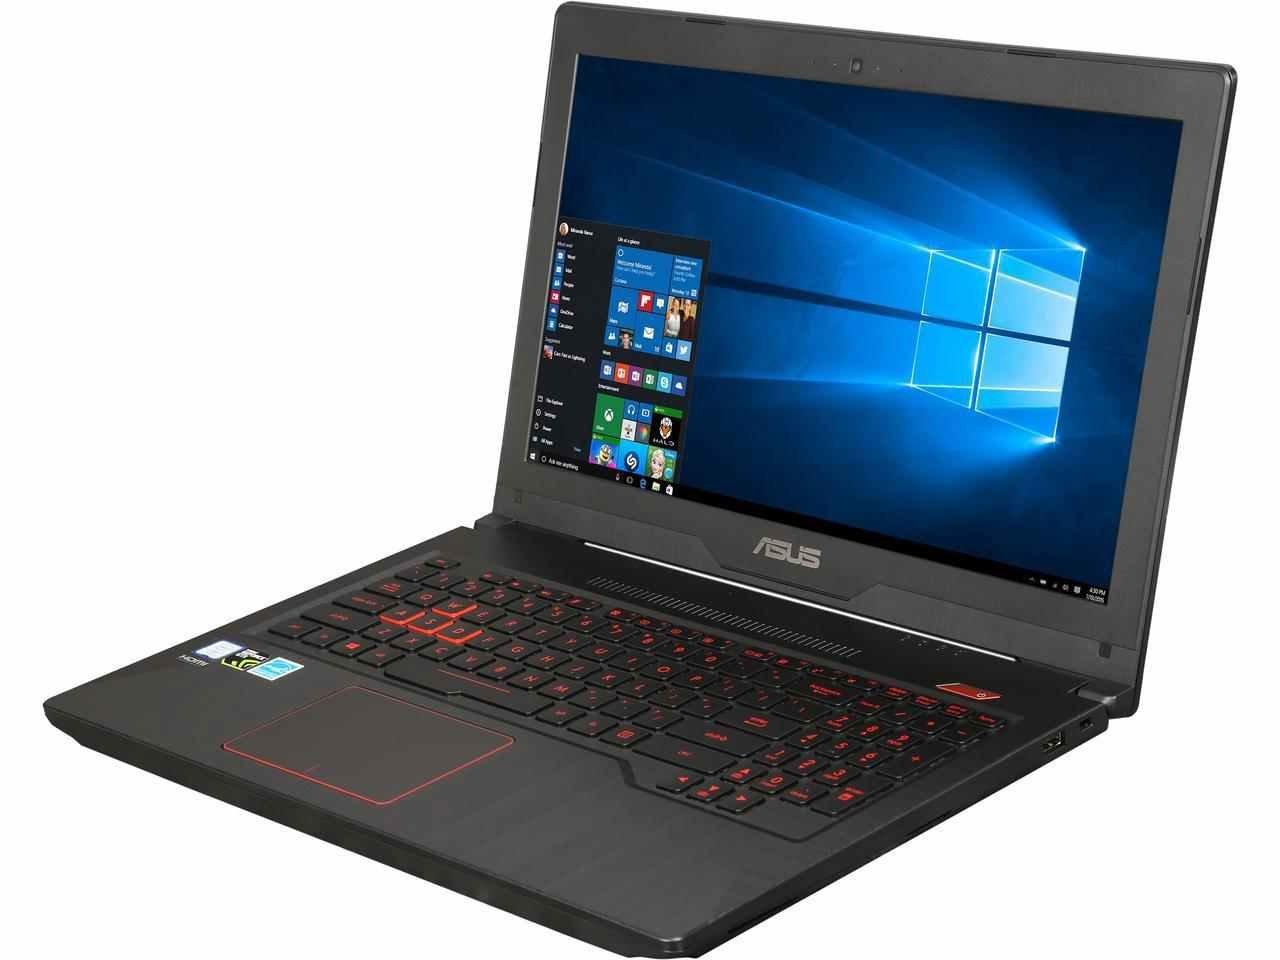 "ASUS FX503VD-EH73 High Performance 15.6"" FHD Gaming and Business Laptop (7th-Generation Intel i7-7700HQ Quad Core, 8GB RAM, 1TB HDD + 128GB SSD, NVIDIA GTX 1050, 15.6'' FHD (1920 x 1080), Win 10 Home)"